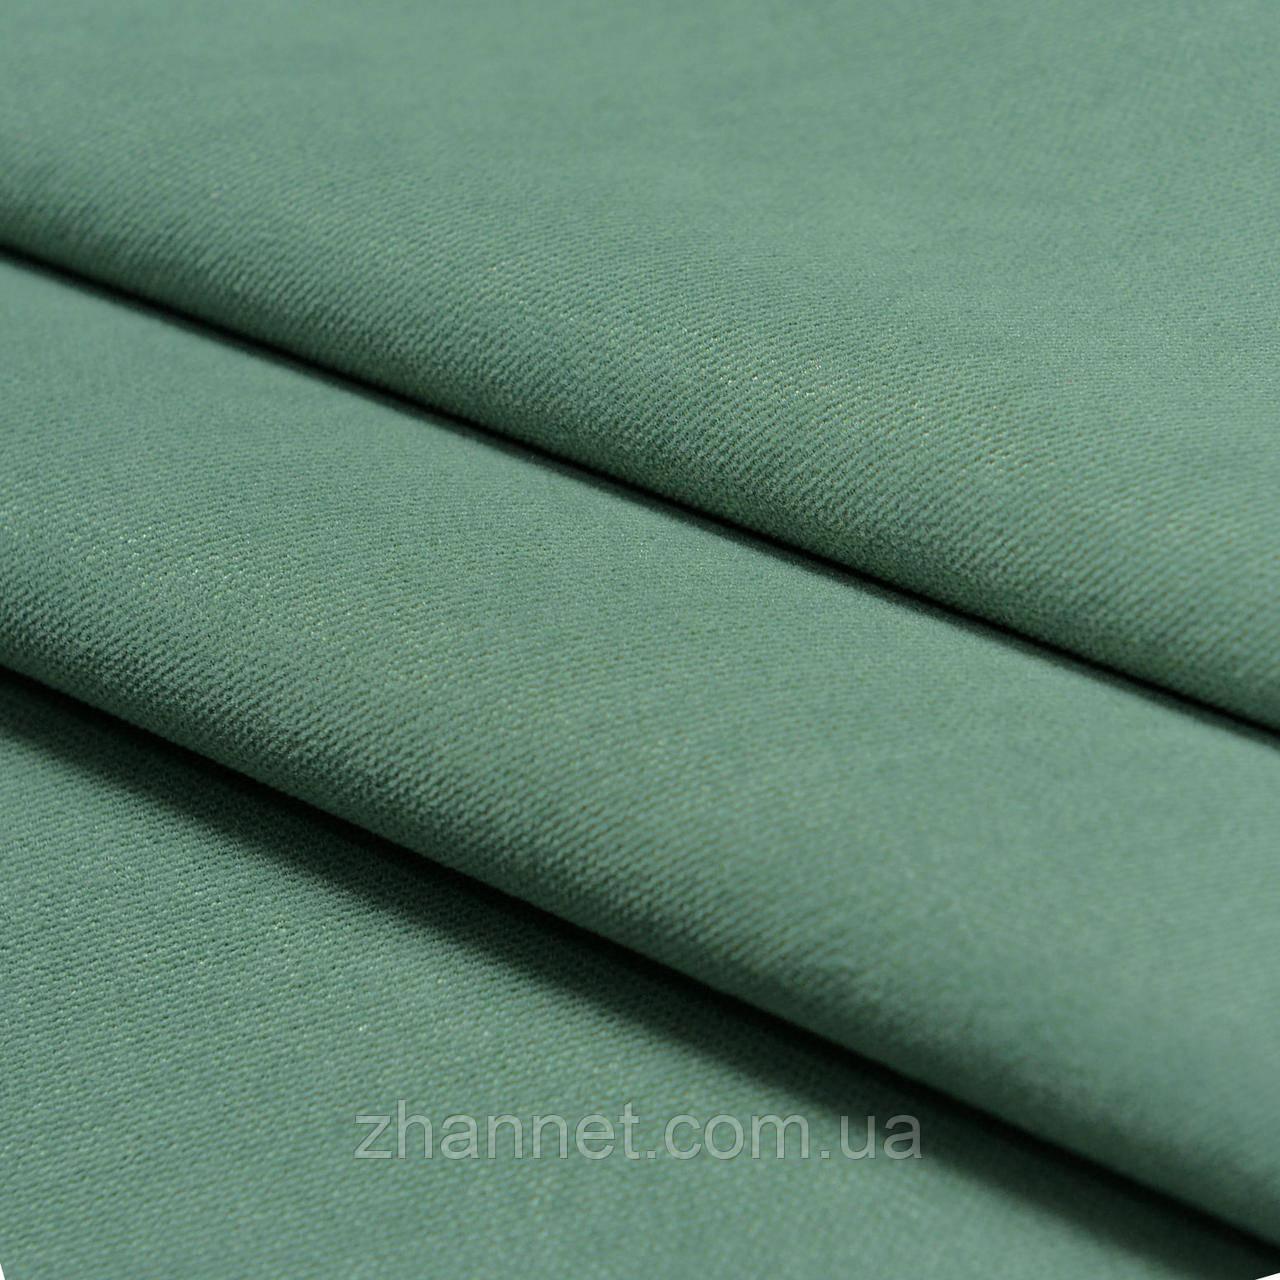 Ткань для штор Diamond морская зелень 295 см (1403208)